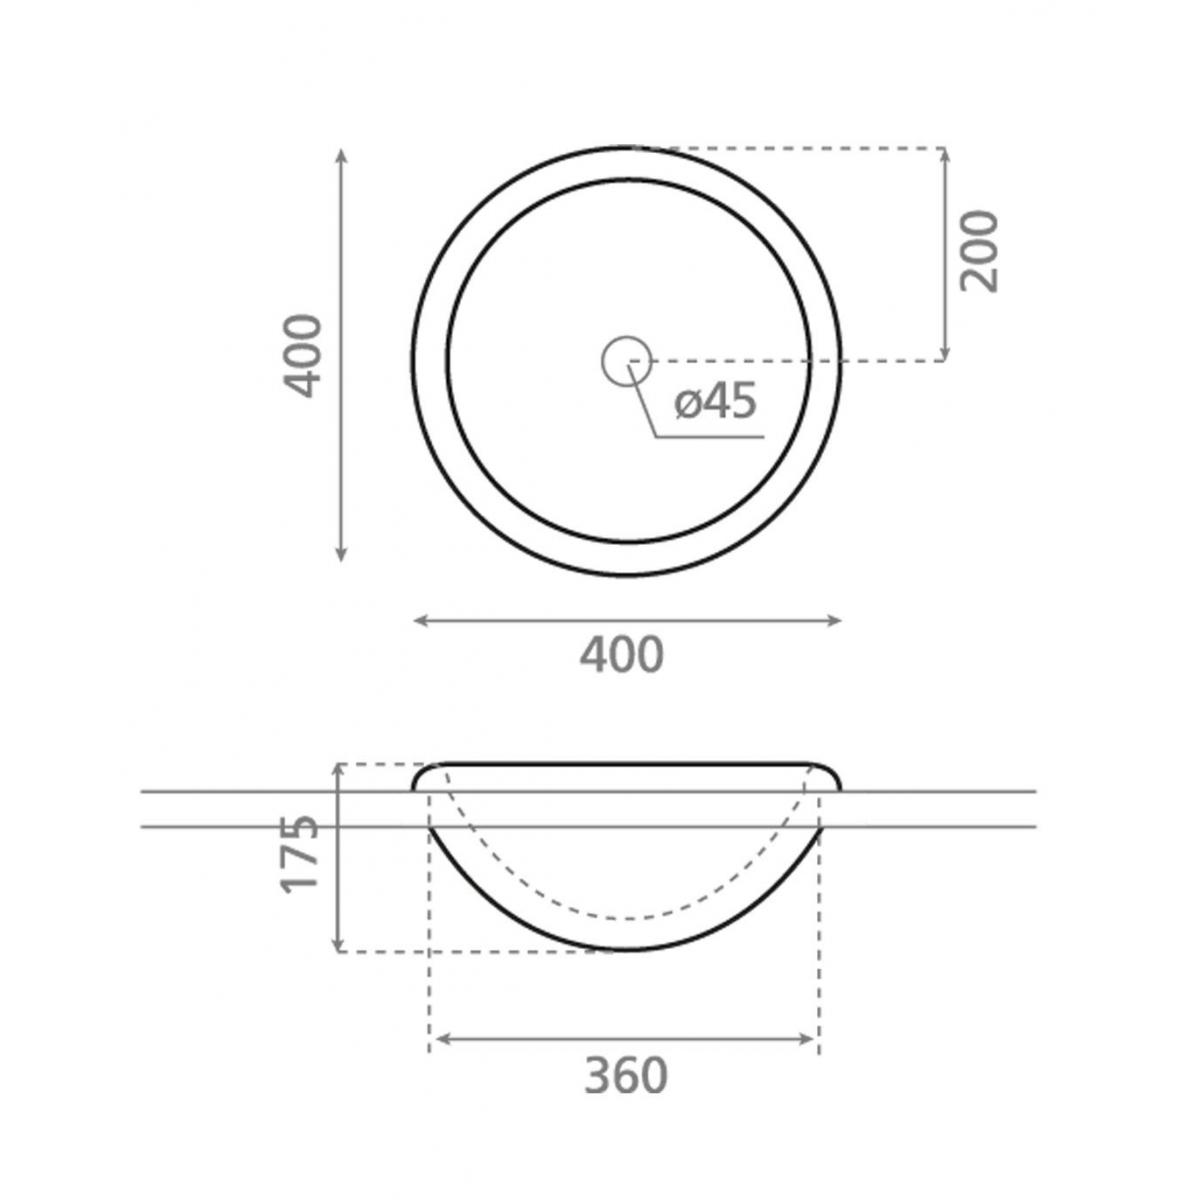 Lavabo Circular Laredo - Lavabos circulares - Marca The Bathco